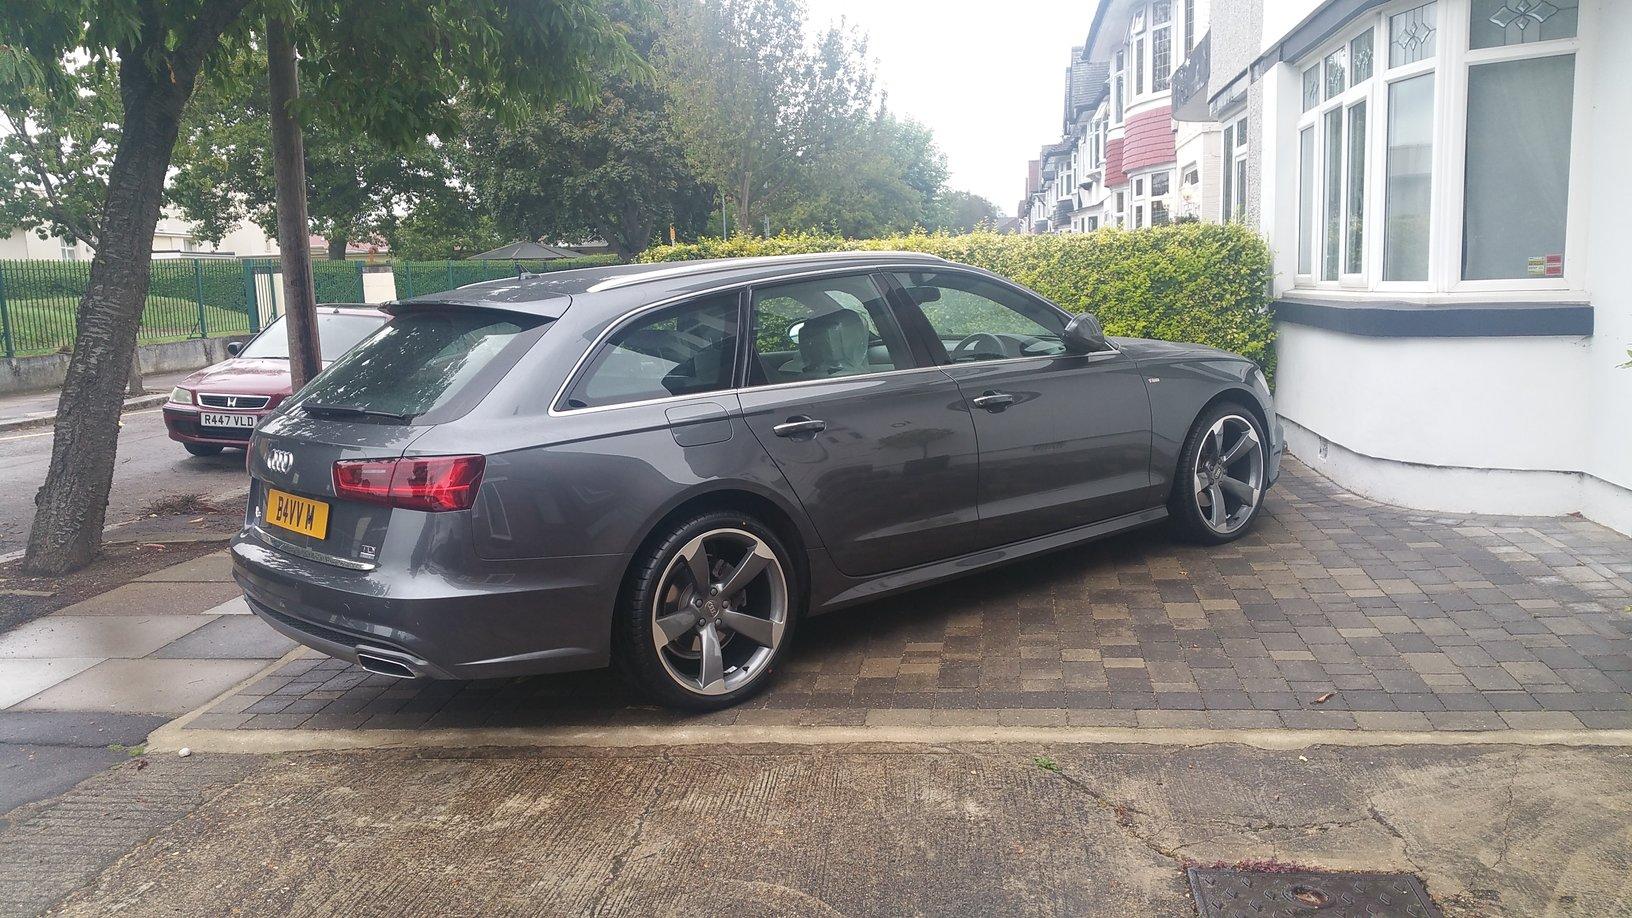 Replica Black Edition Rs6 Wheels Audi Sport Net